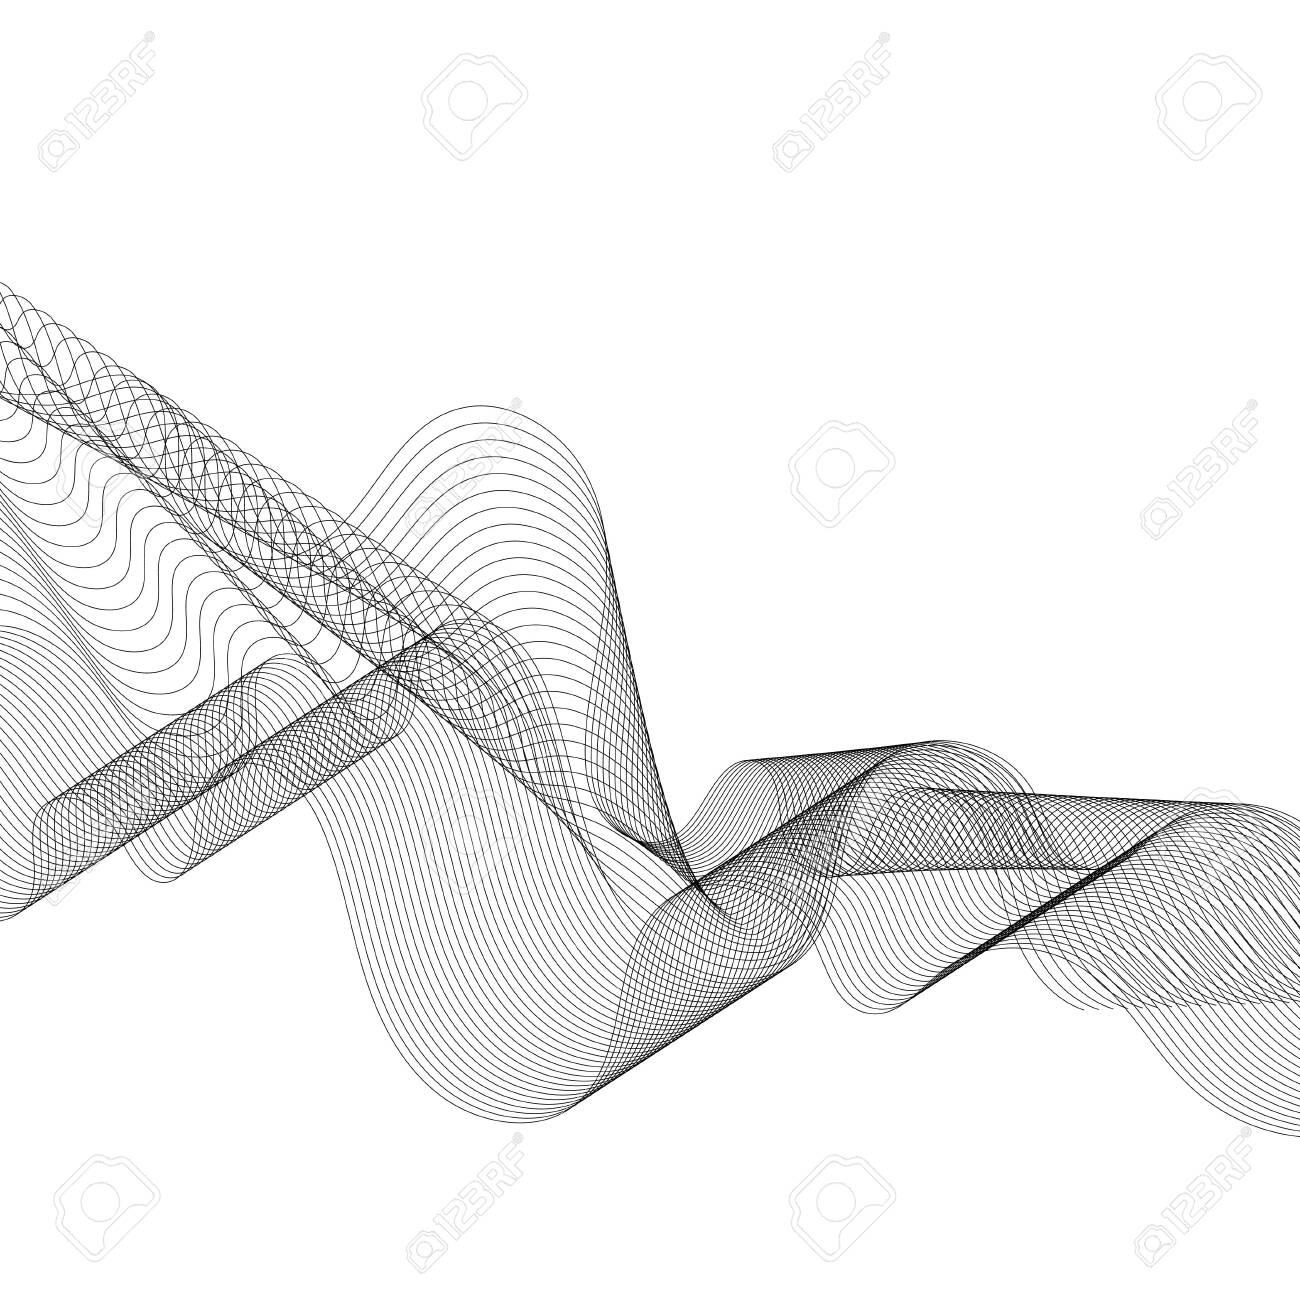 Black moiré wave on white background - 122626829